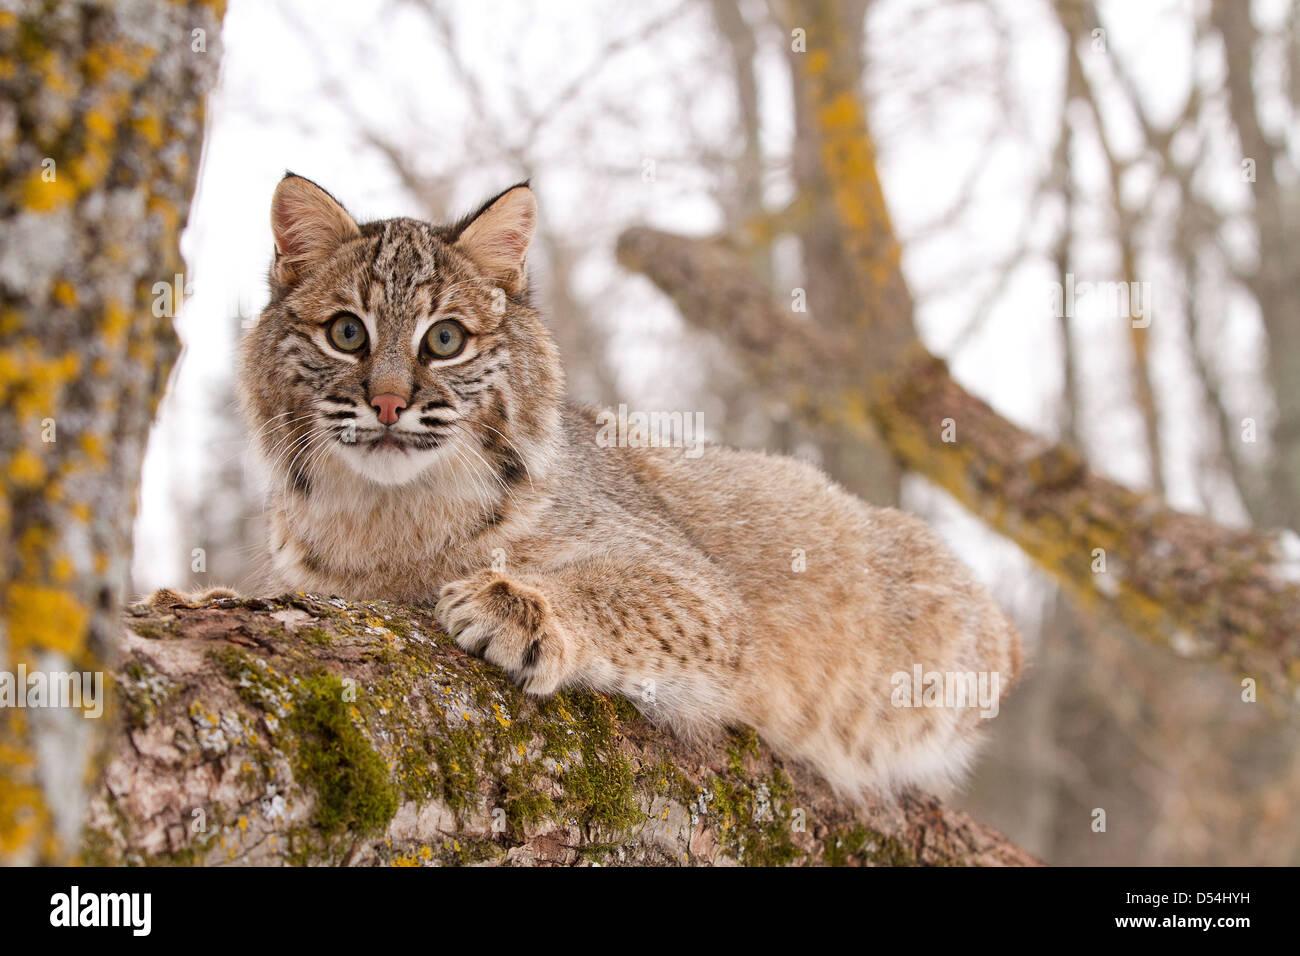 Bobcat, Lynx rufus climbing a tree - Stock Image